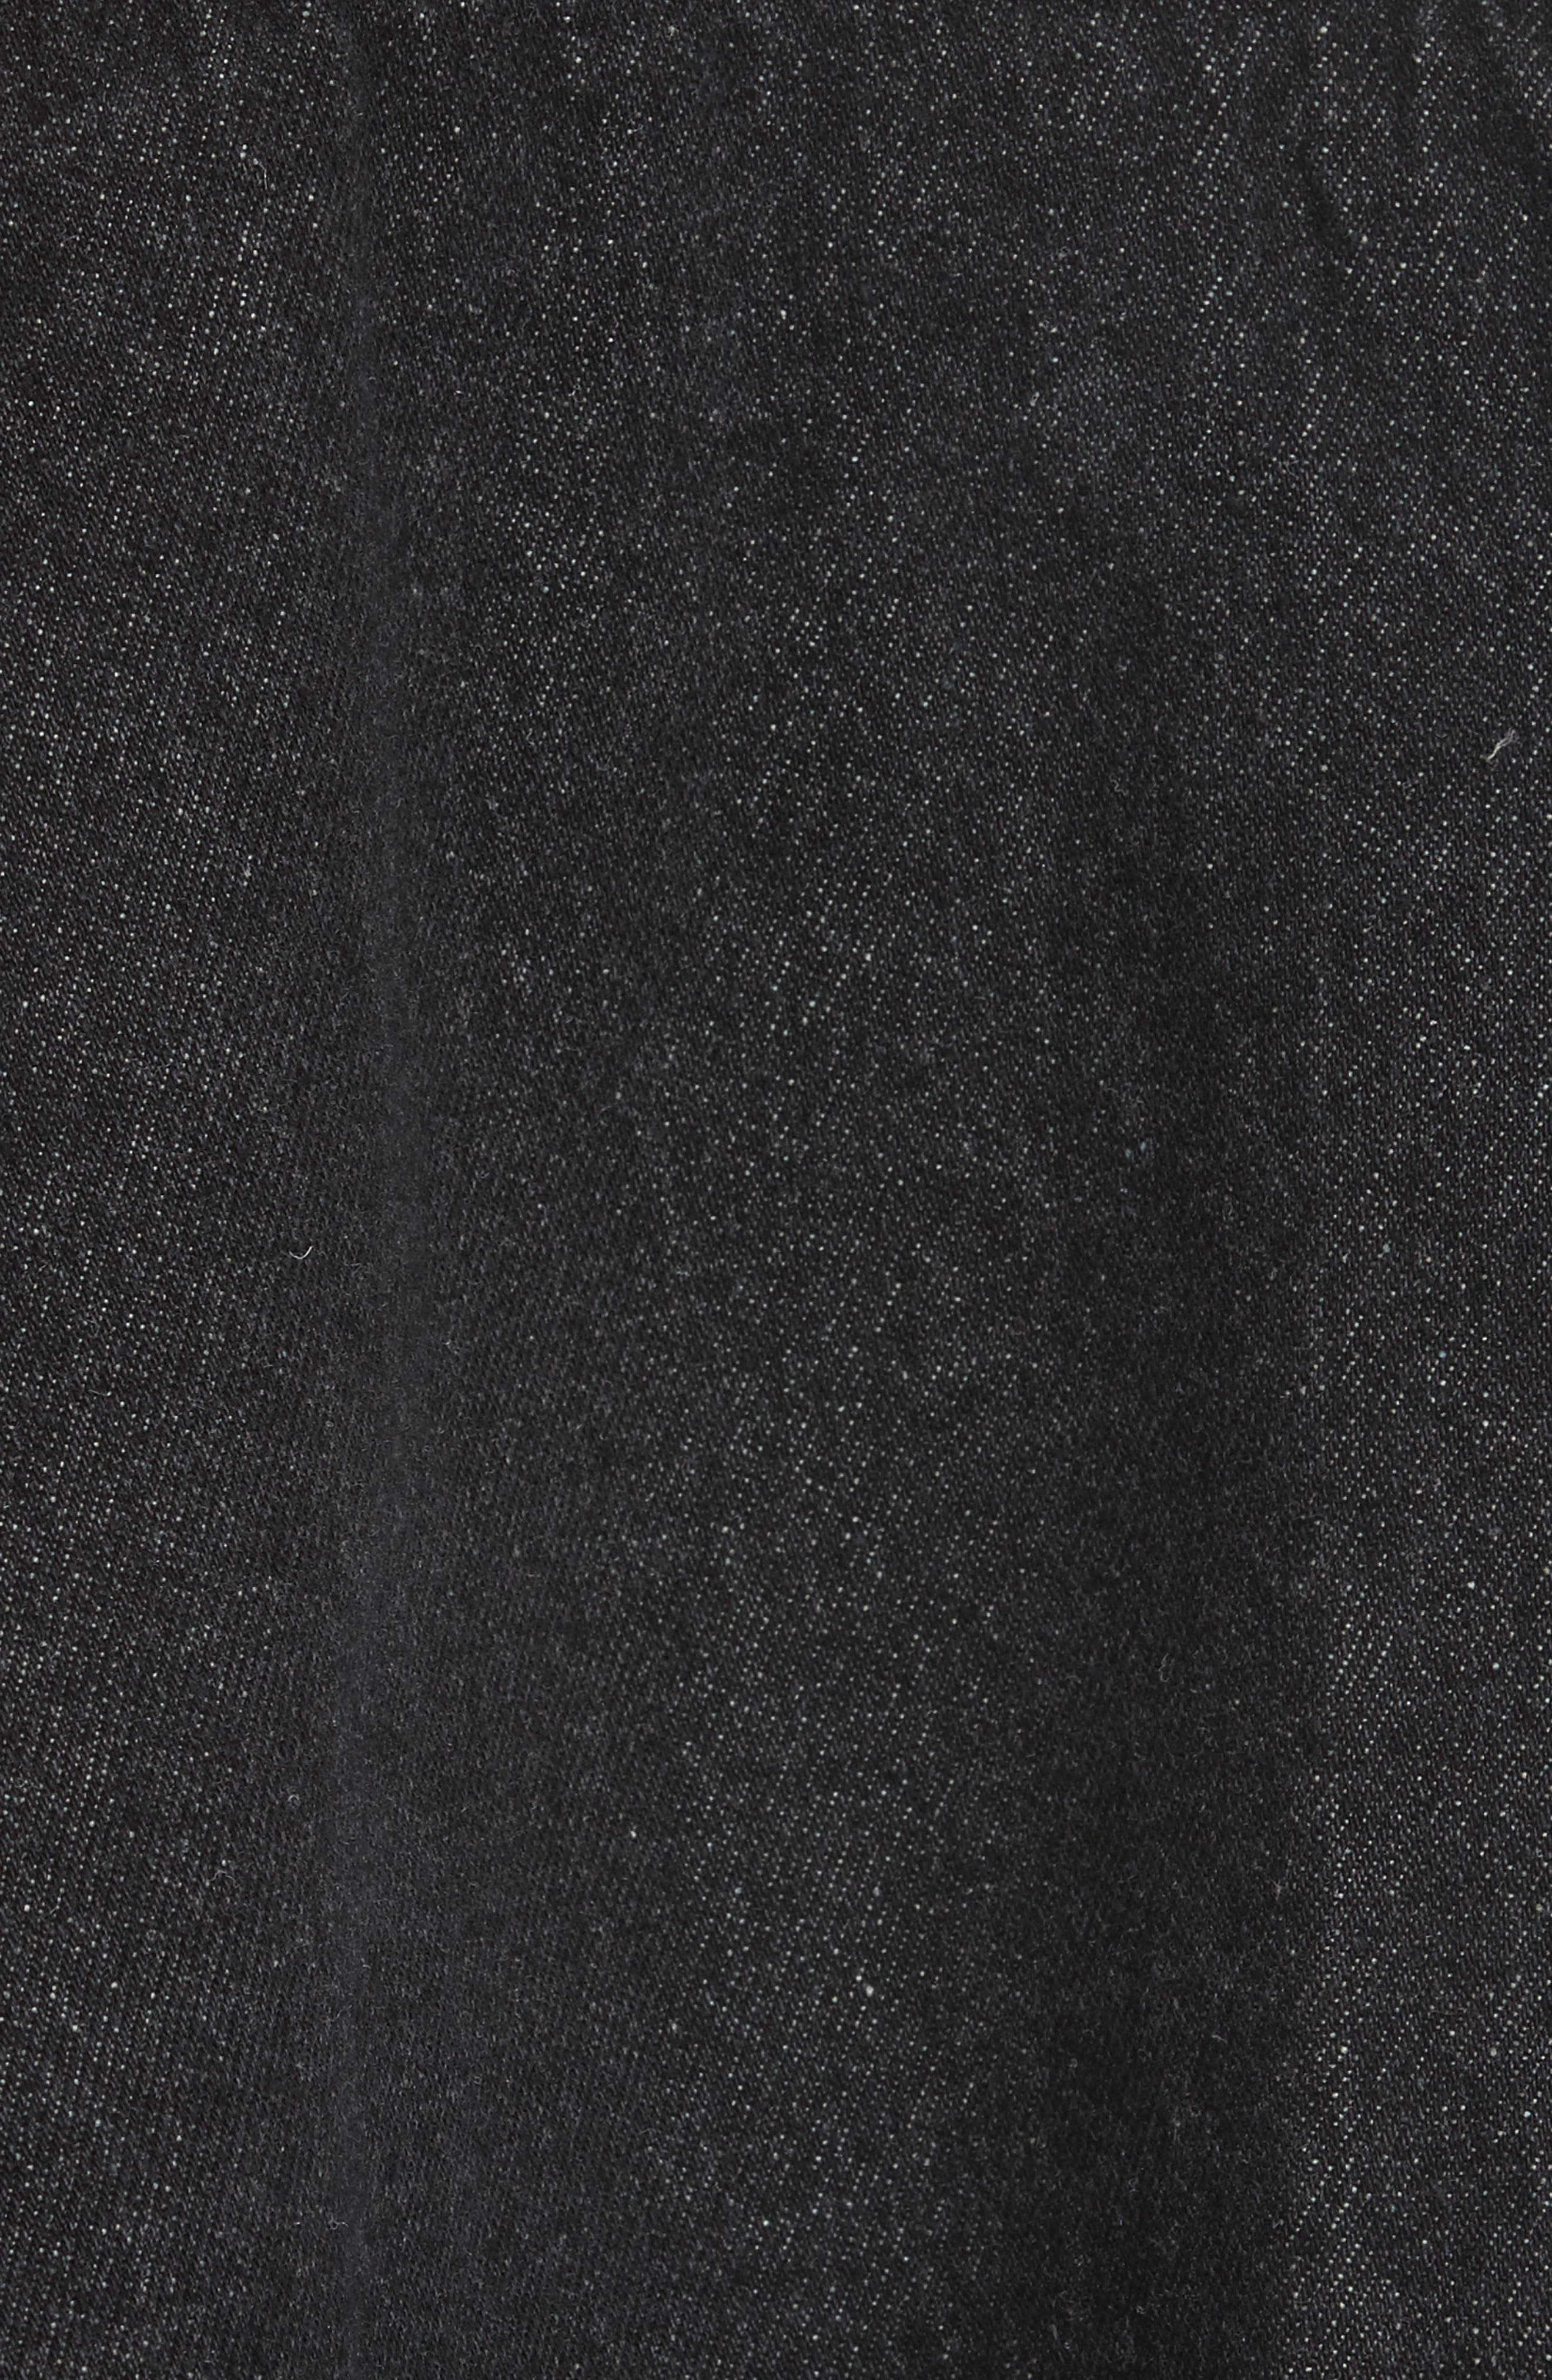 Denim Ruffle Shirt,                             Alternate thumbnail 5, color,                             001